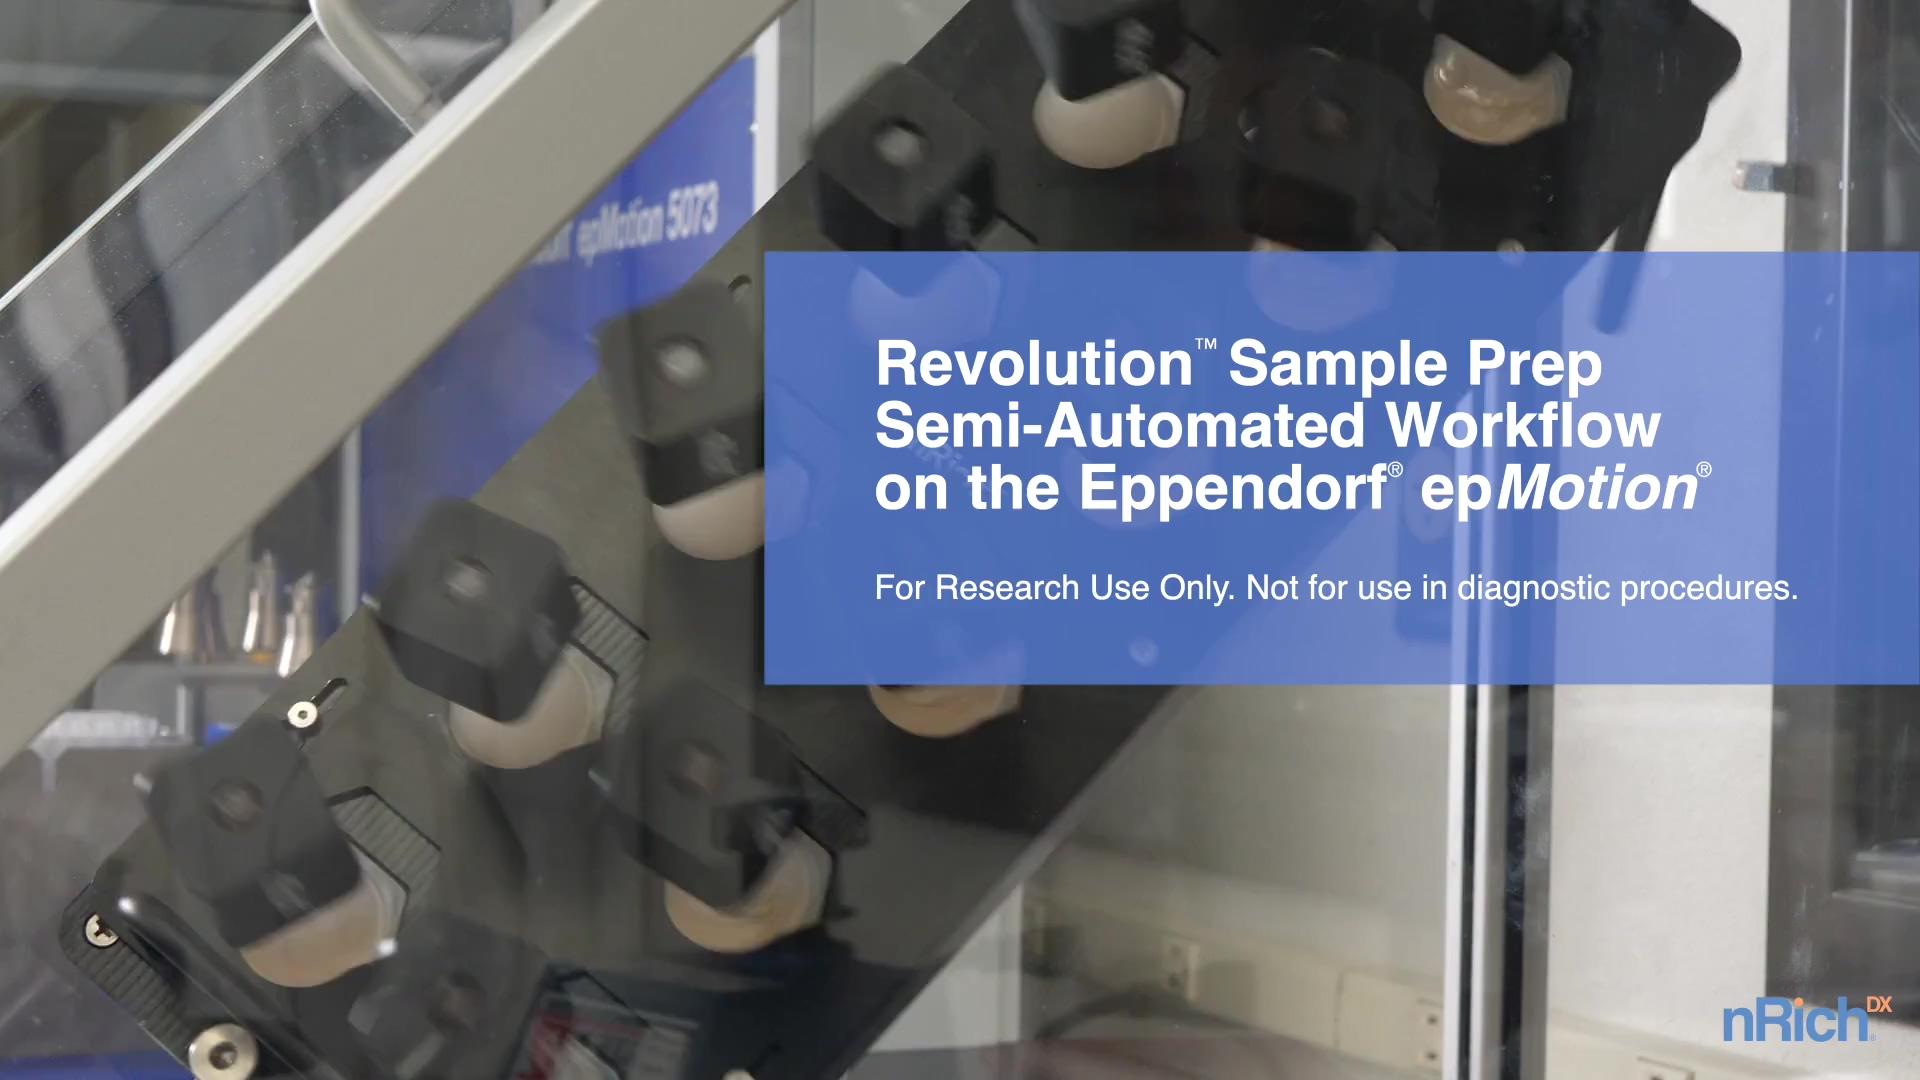 Revolution Semi-Auto Soln on the epMotion_HD_FINAL